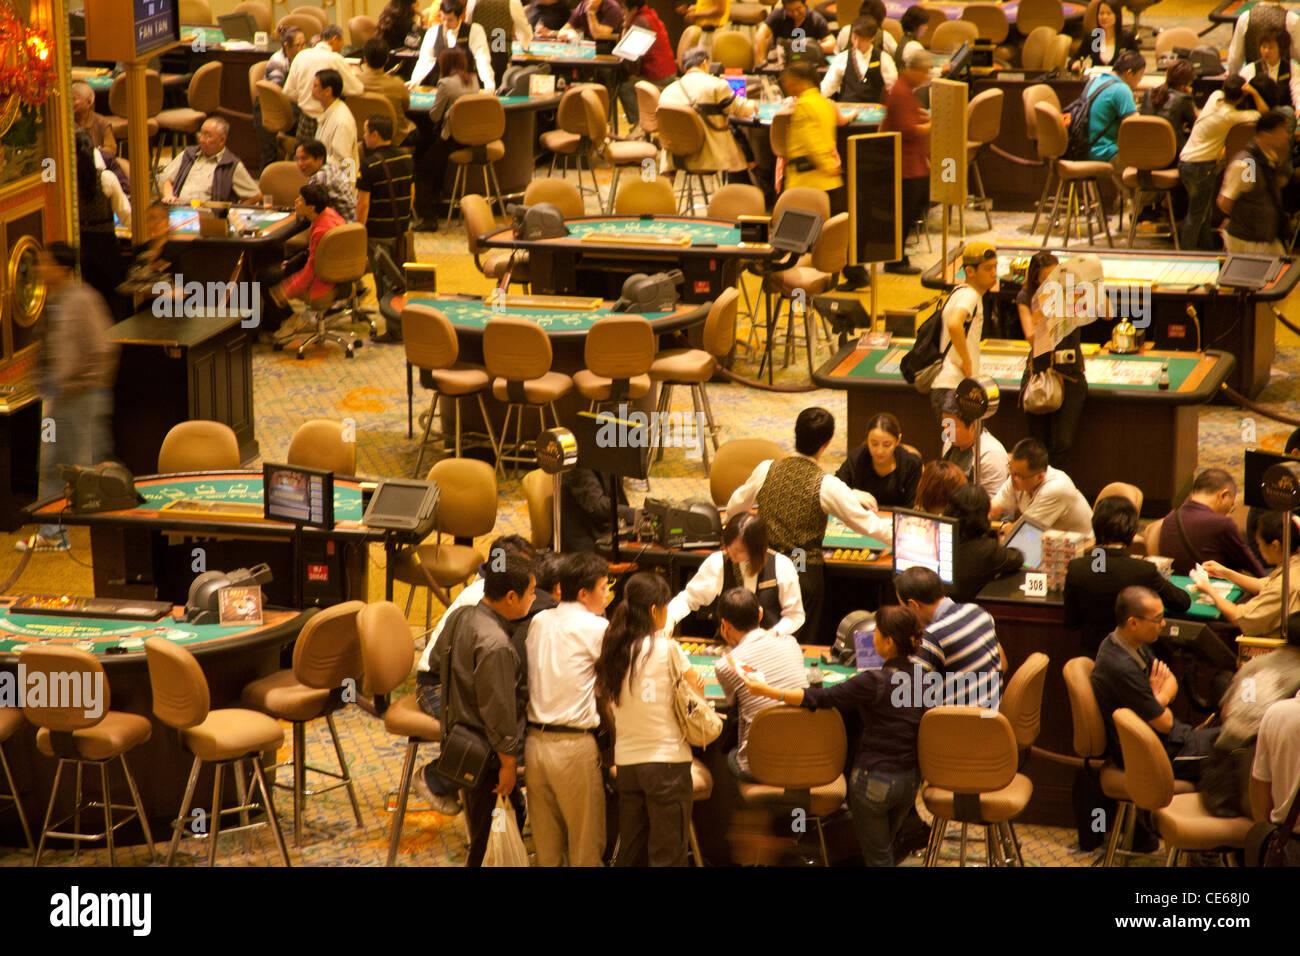 People gambling in the Venetian Casino, Venetian Casino and Hotel Cotai Complex, Strip Macau SAR China - Stock Image